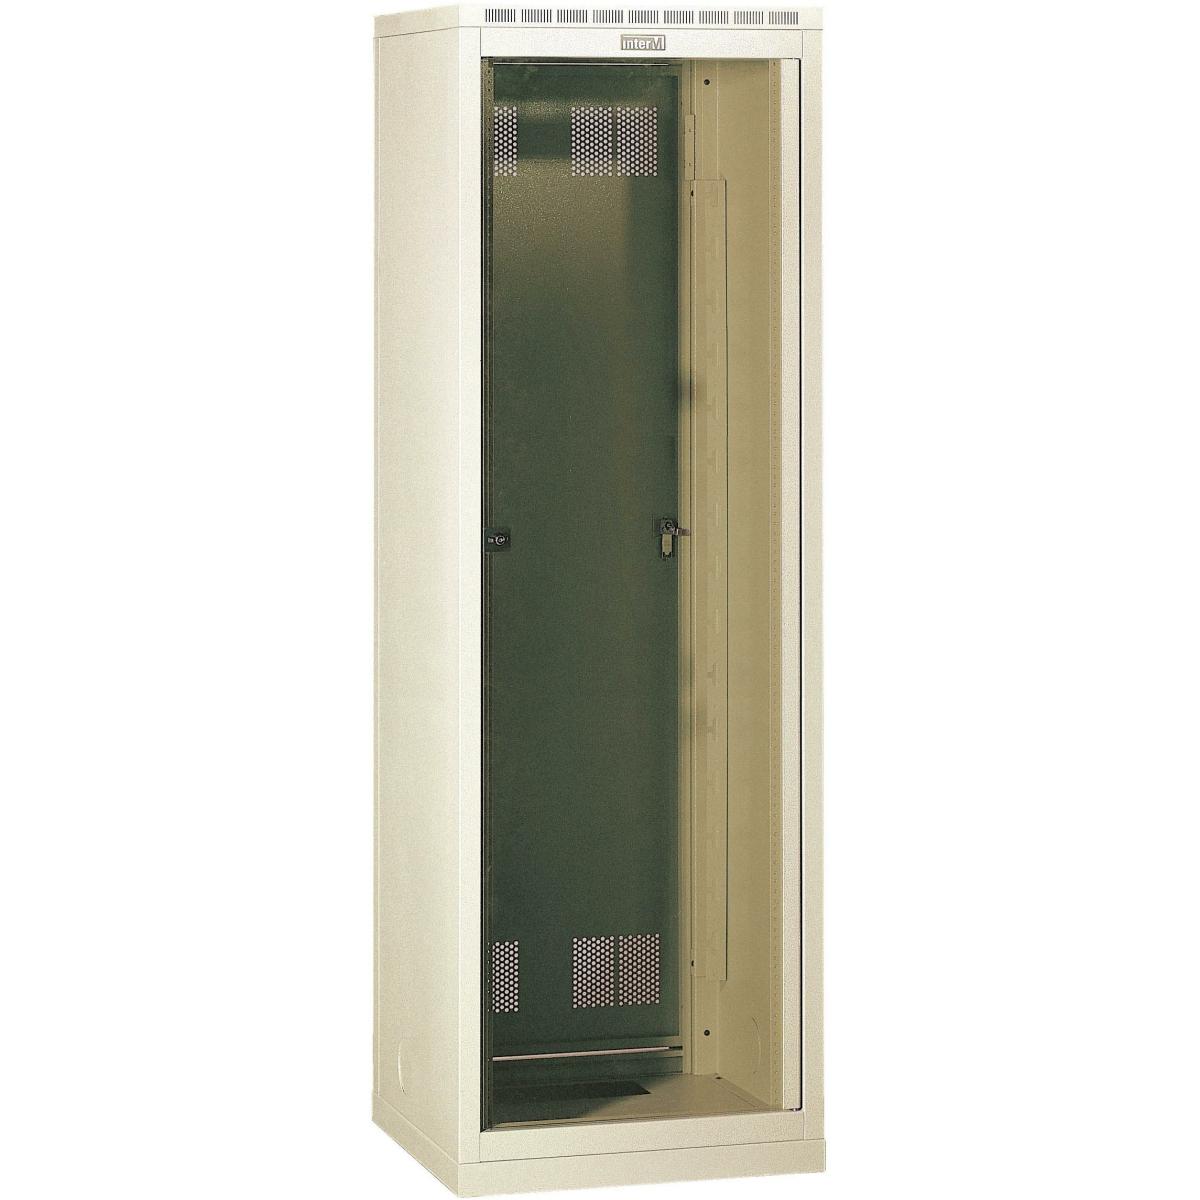 Шкаф аппаратный Inter-M Inter-M PR-391A 0 pr на 100